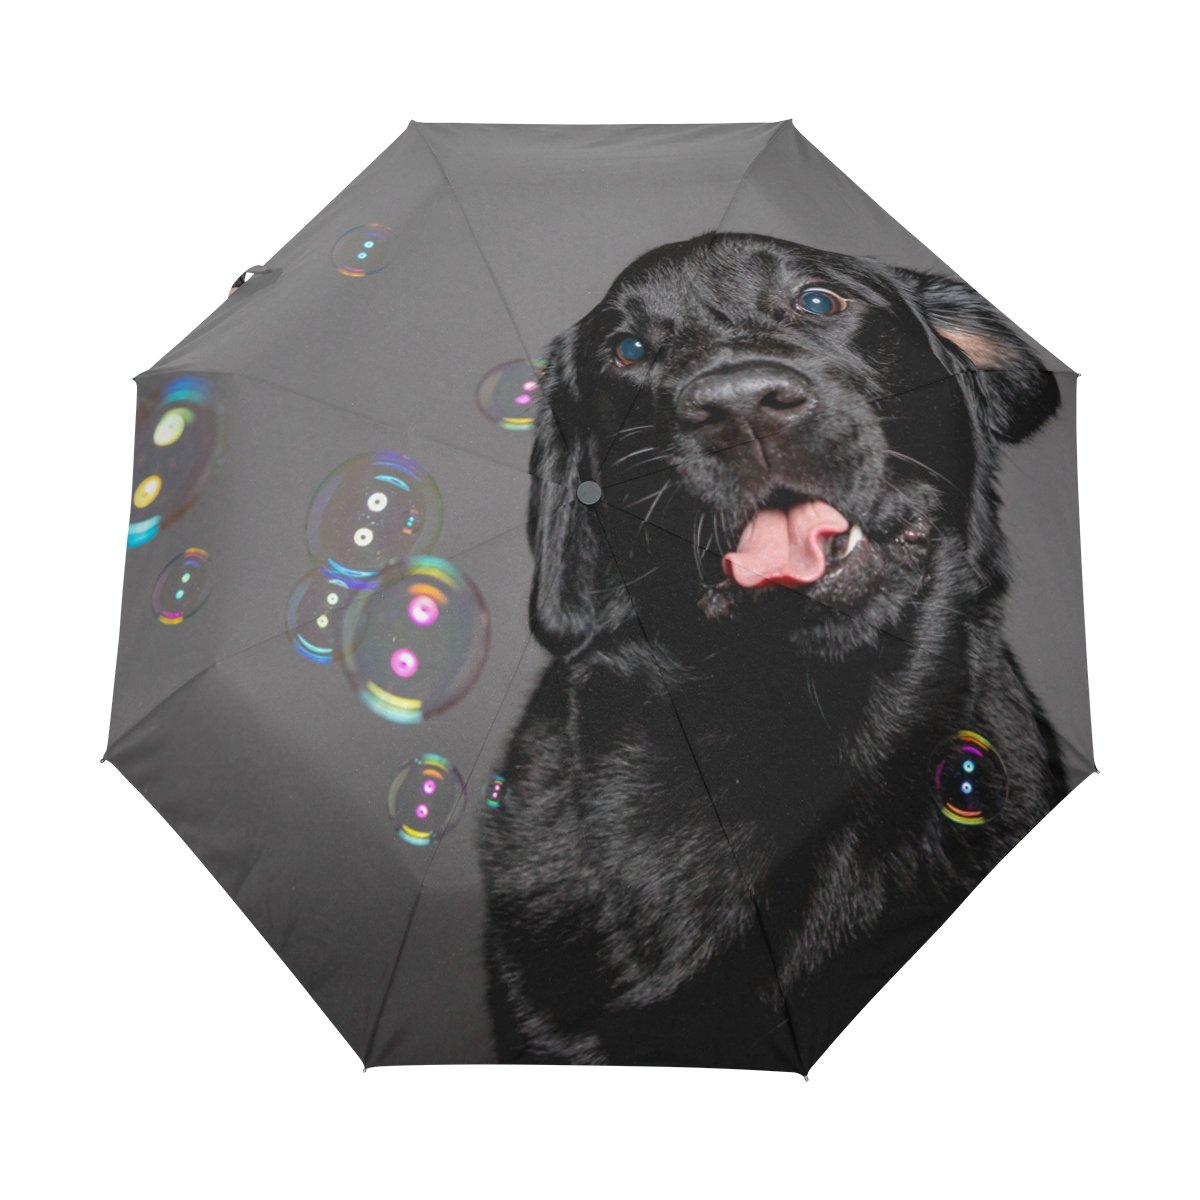 Senya Saobao防風と防雨トラベル傘with自動開いて閉じFoldingブラック犬in Showerポータブル折りたたみ式太陽雨傘 B07FJLS4MX